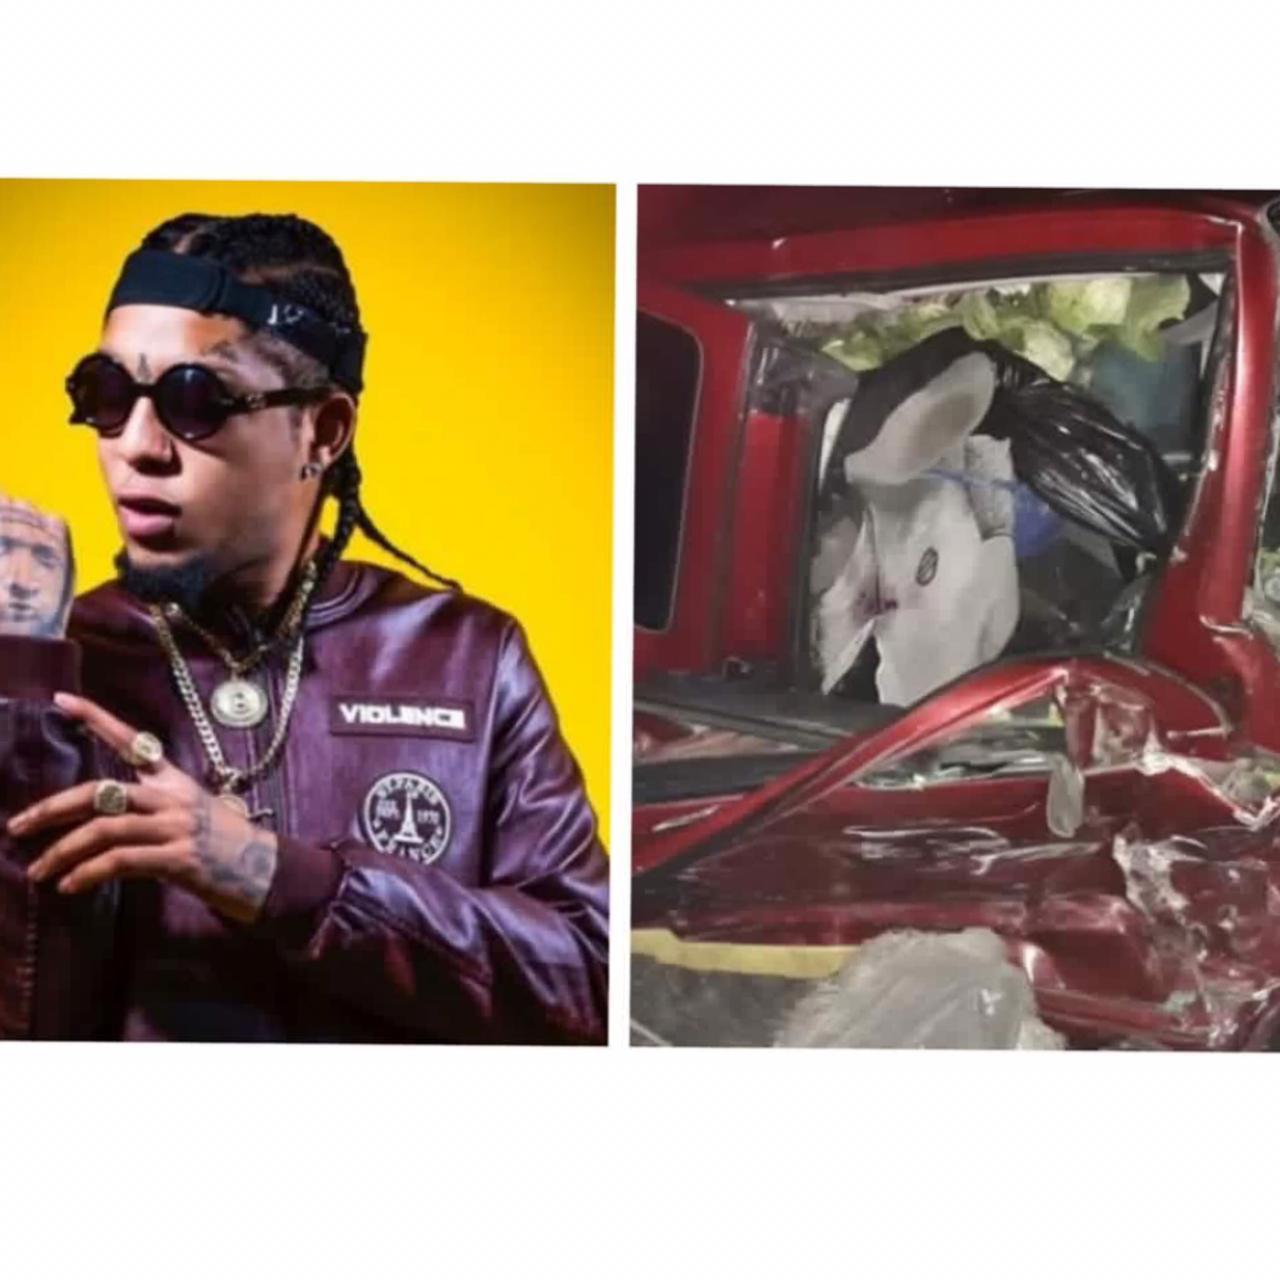 Artista urbano «Rochy RD» sufre aparatoso accidente